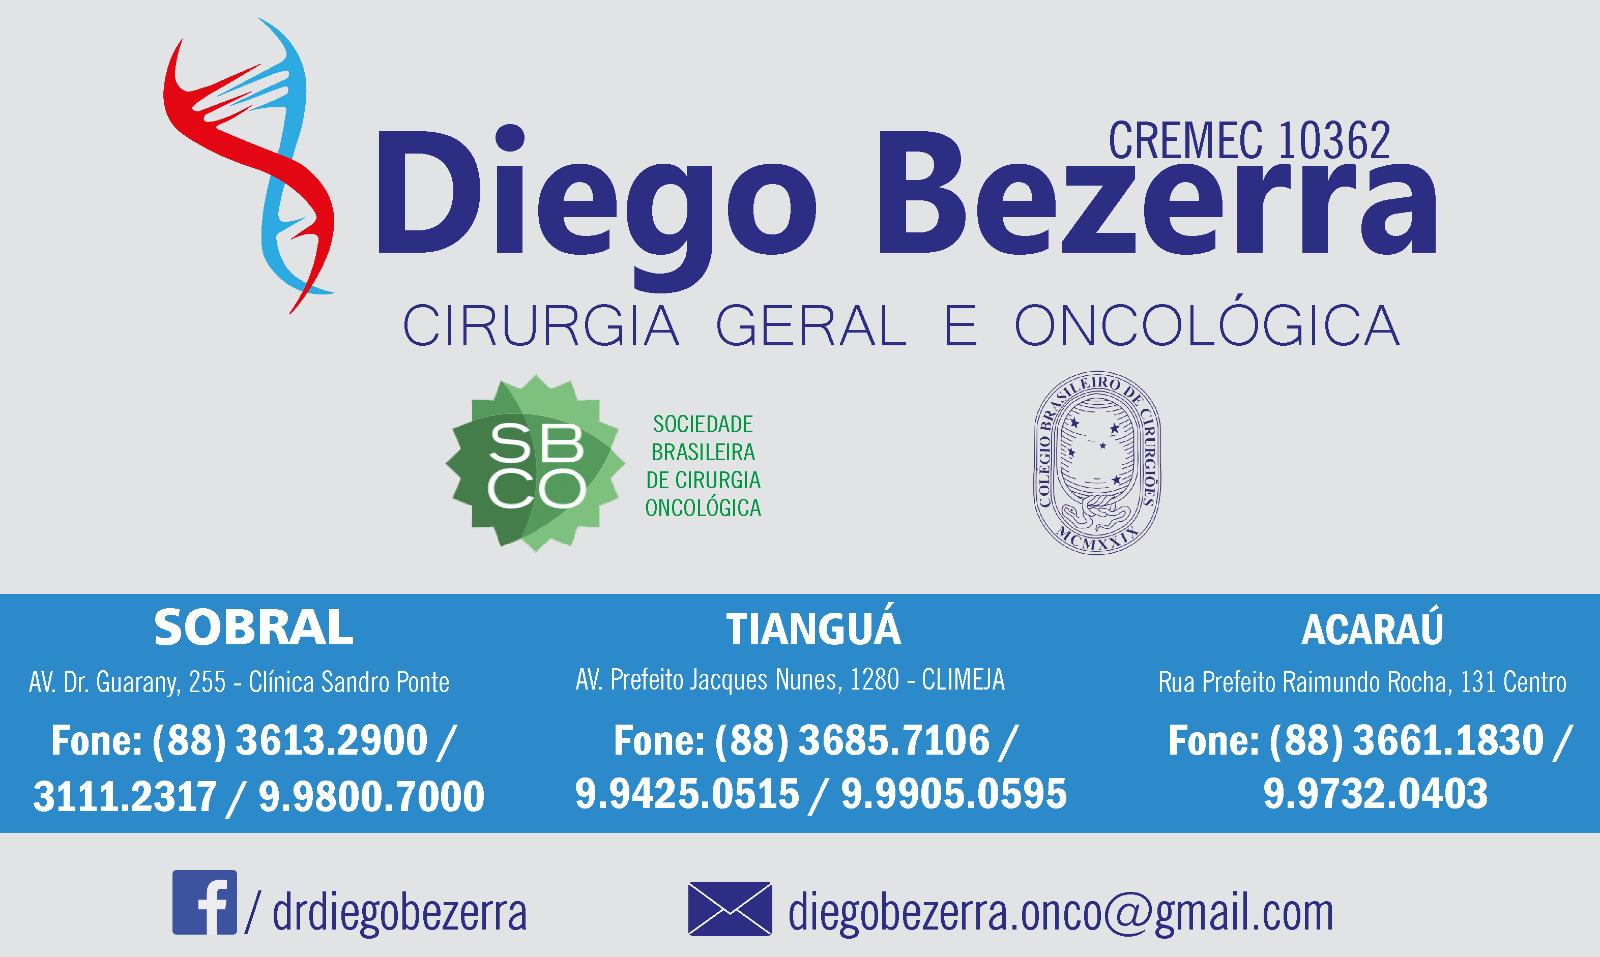 Dr. DIEGO BEZERRA